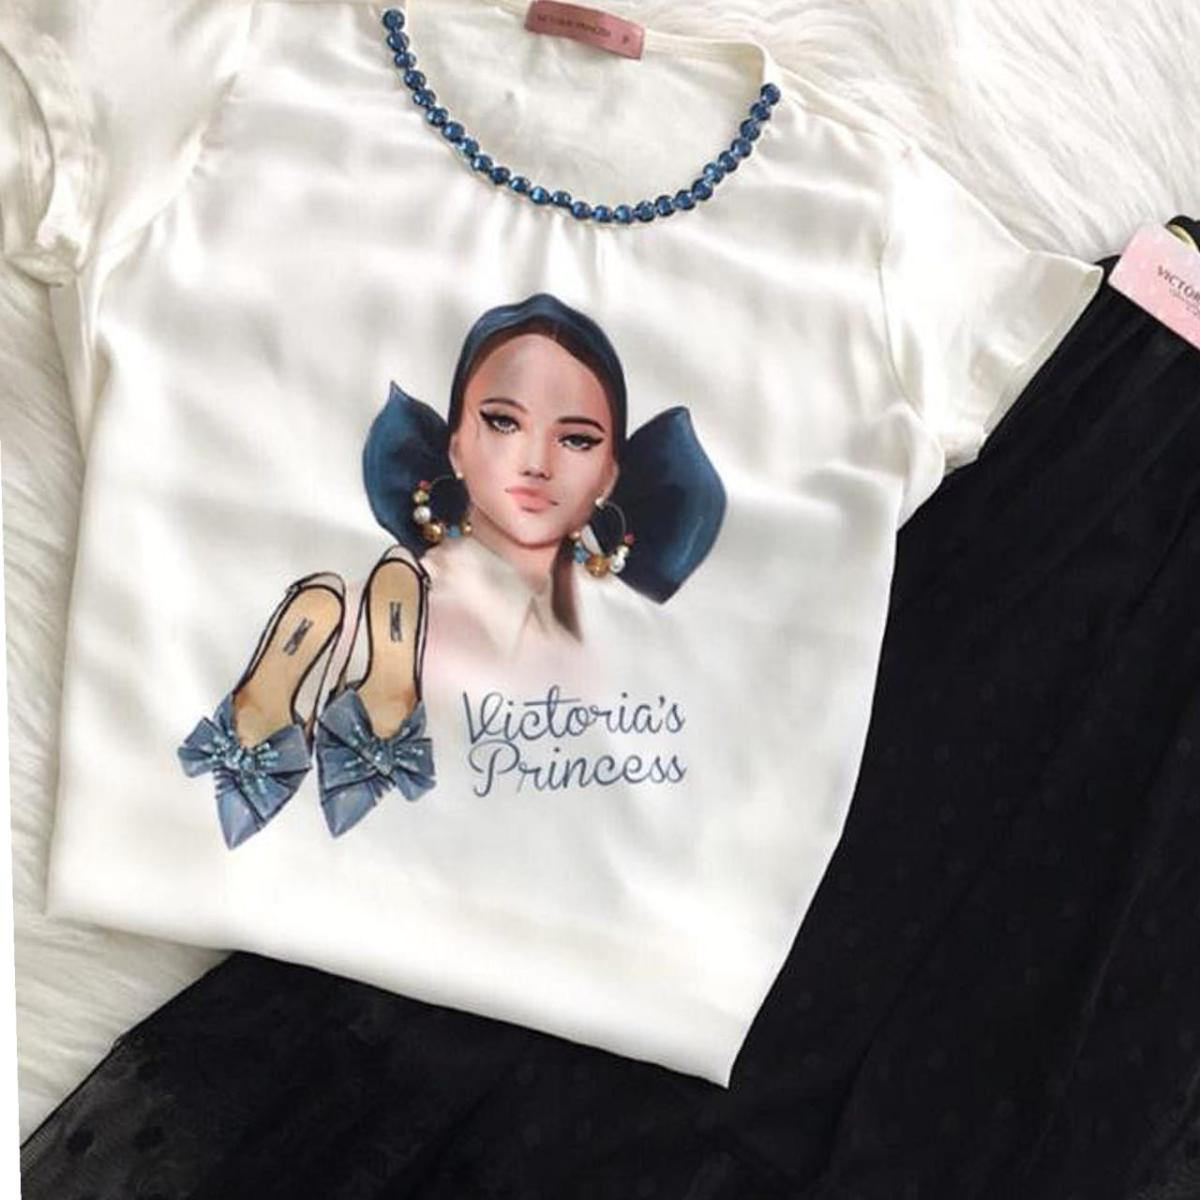 Blusa Estampa Sapato Azul - Victorias Princess